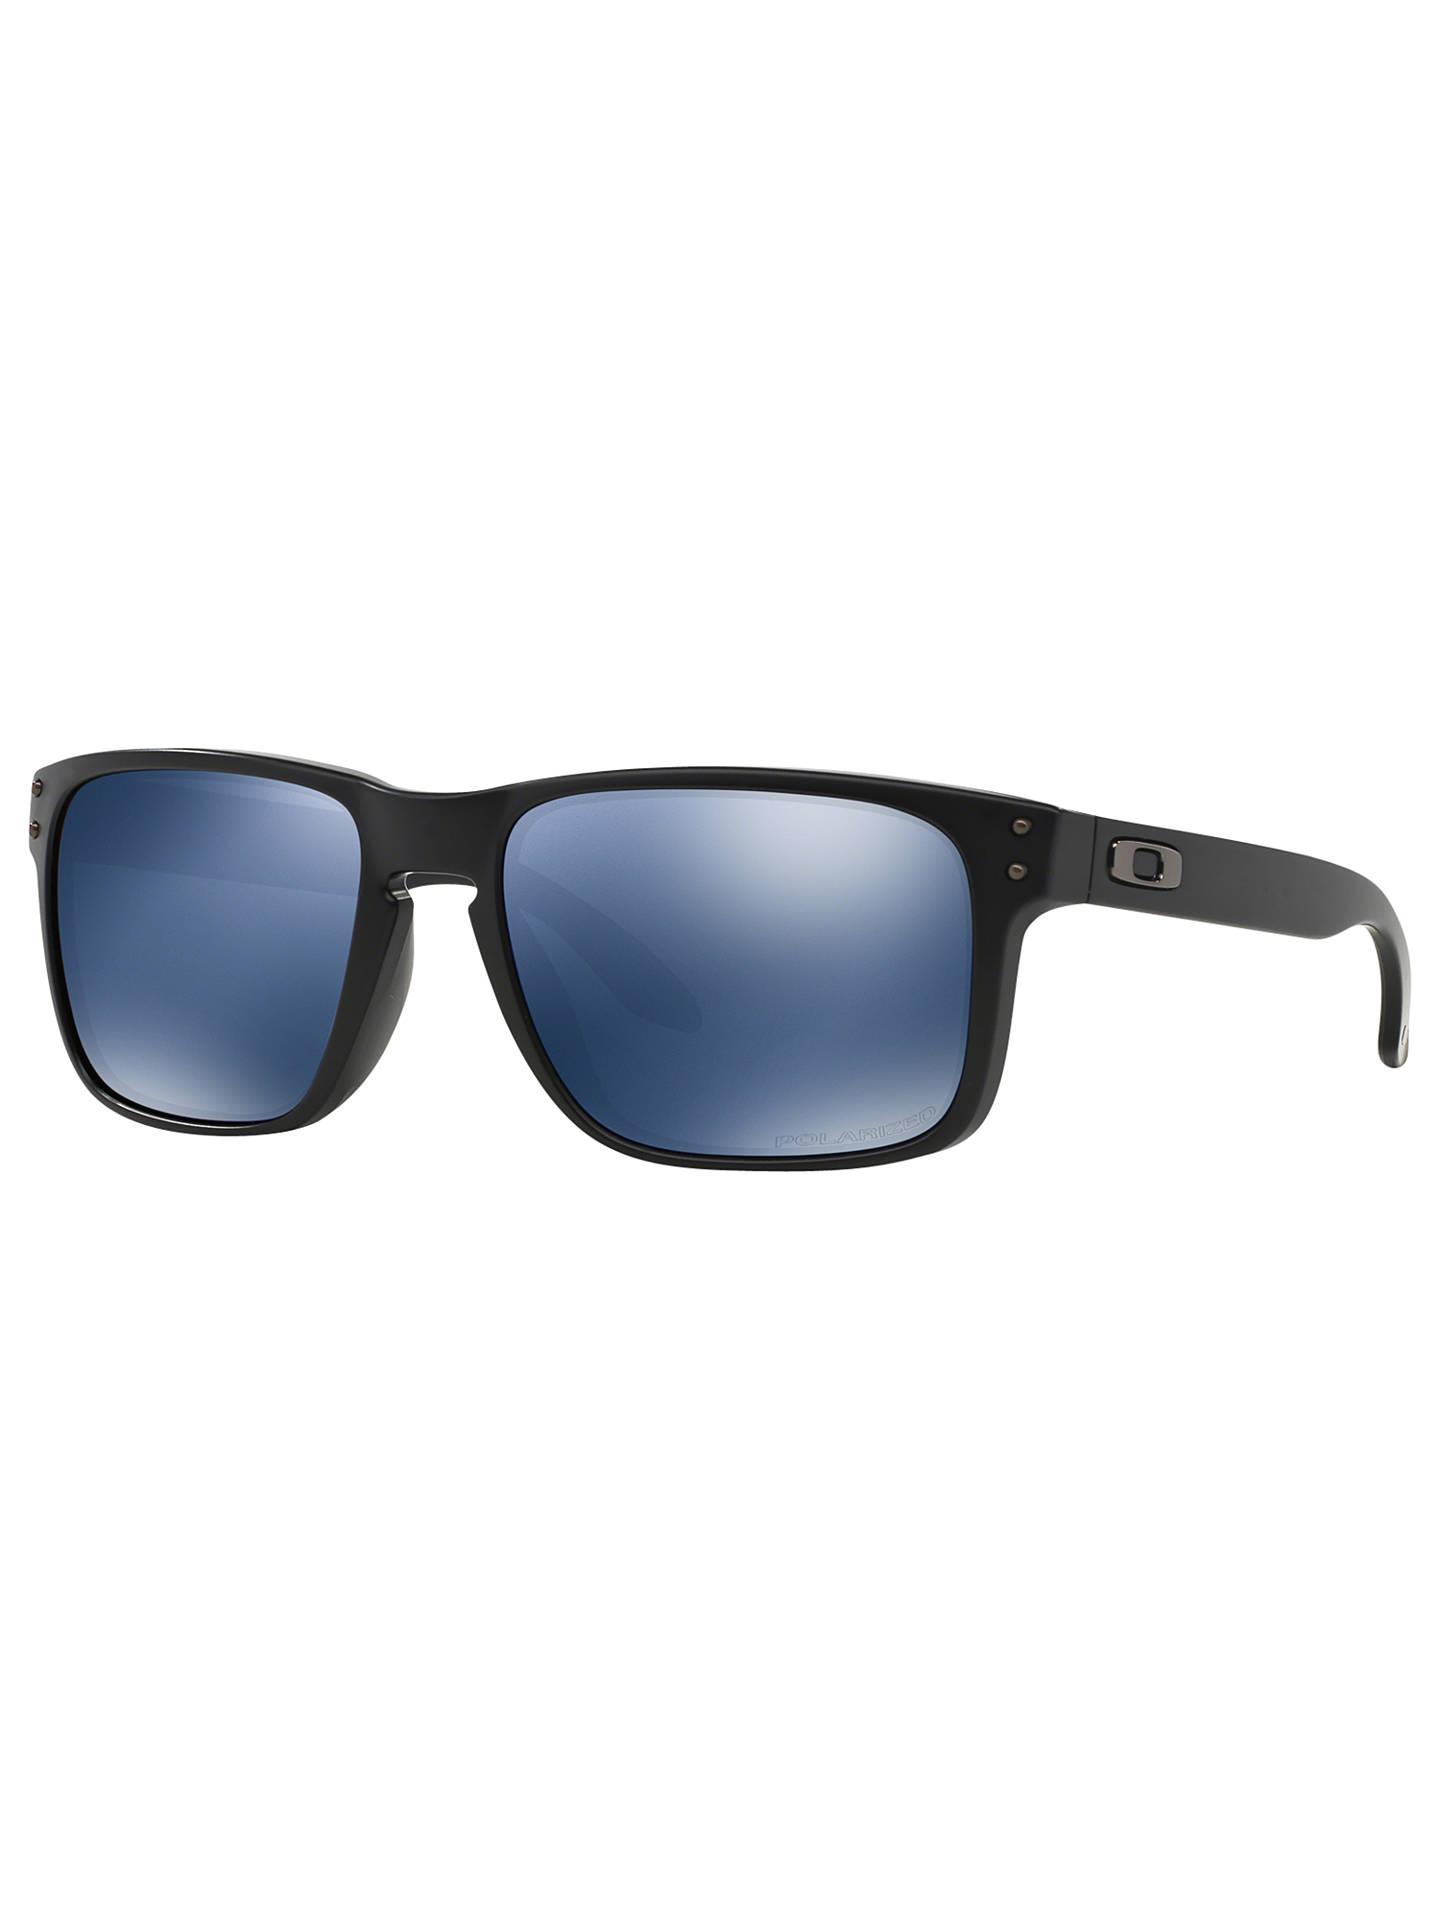 8cfcf8f5b71e Oakley OO9102 Holbrook Polarised Sunglasses at John Lewis   Partners